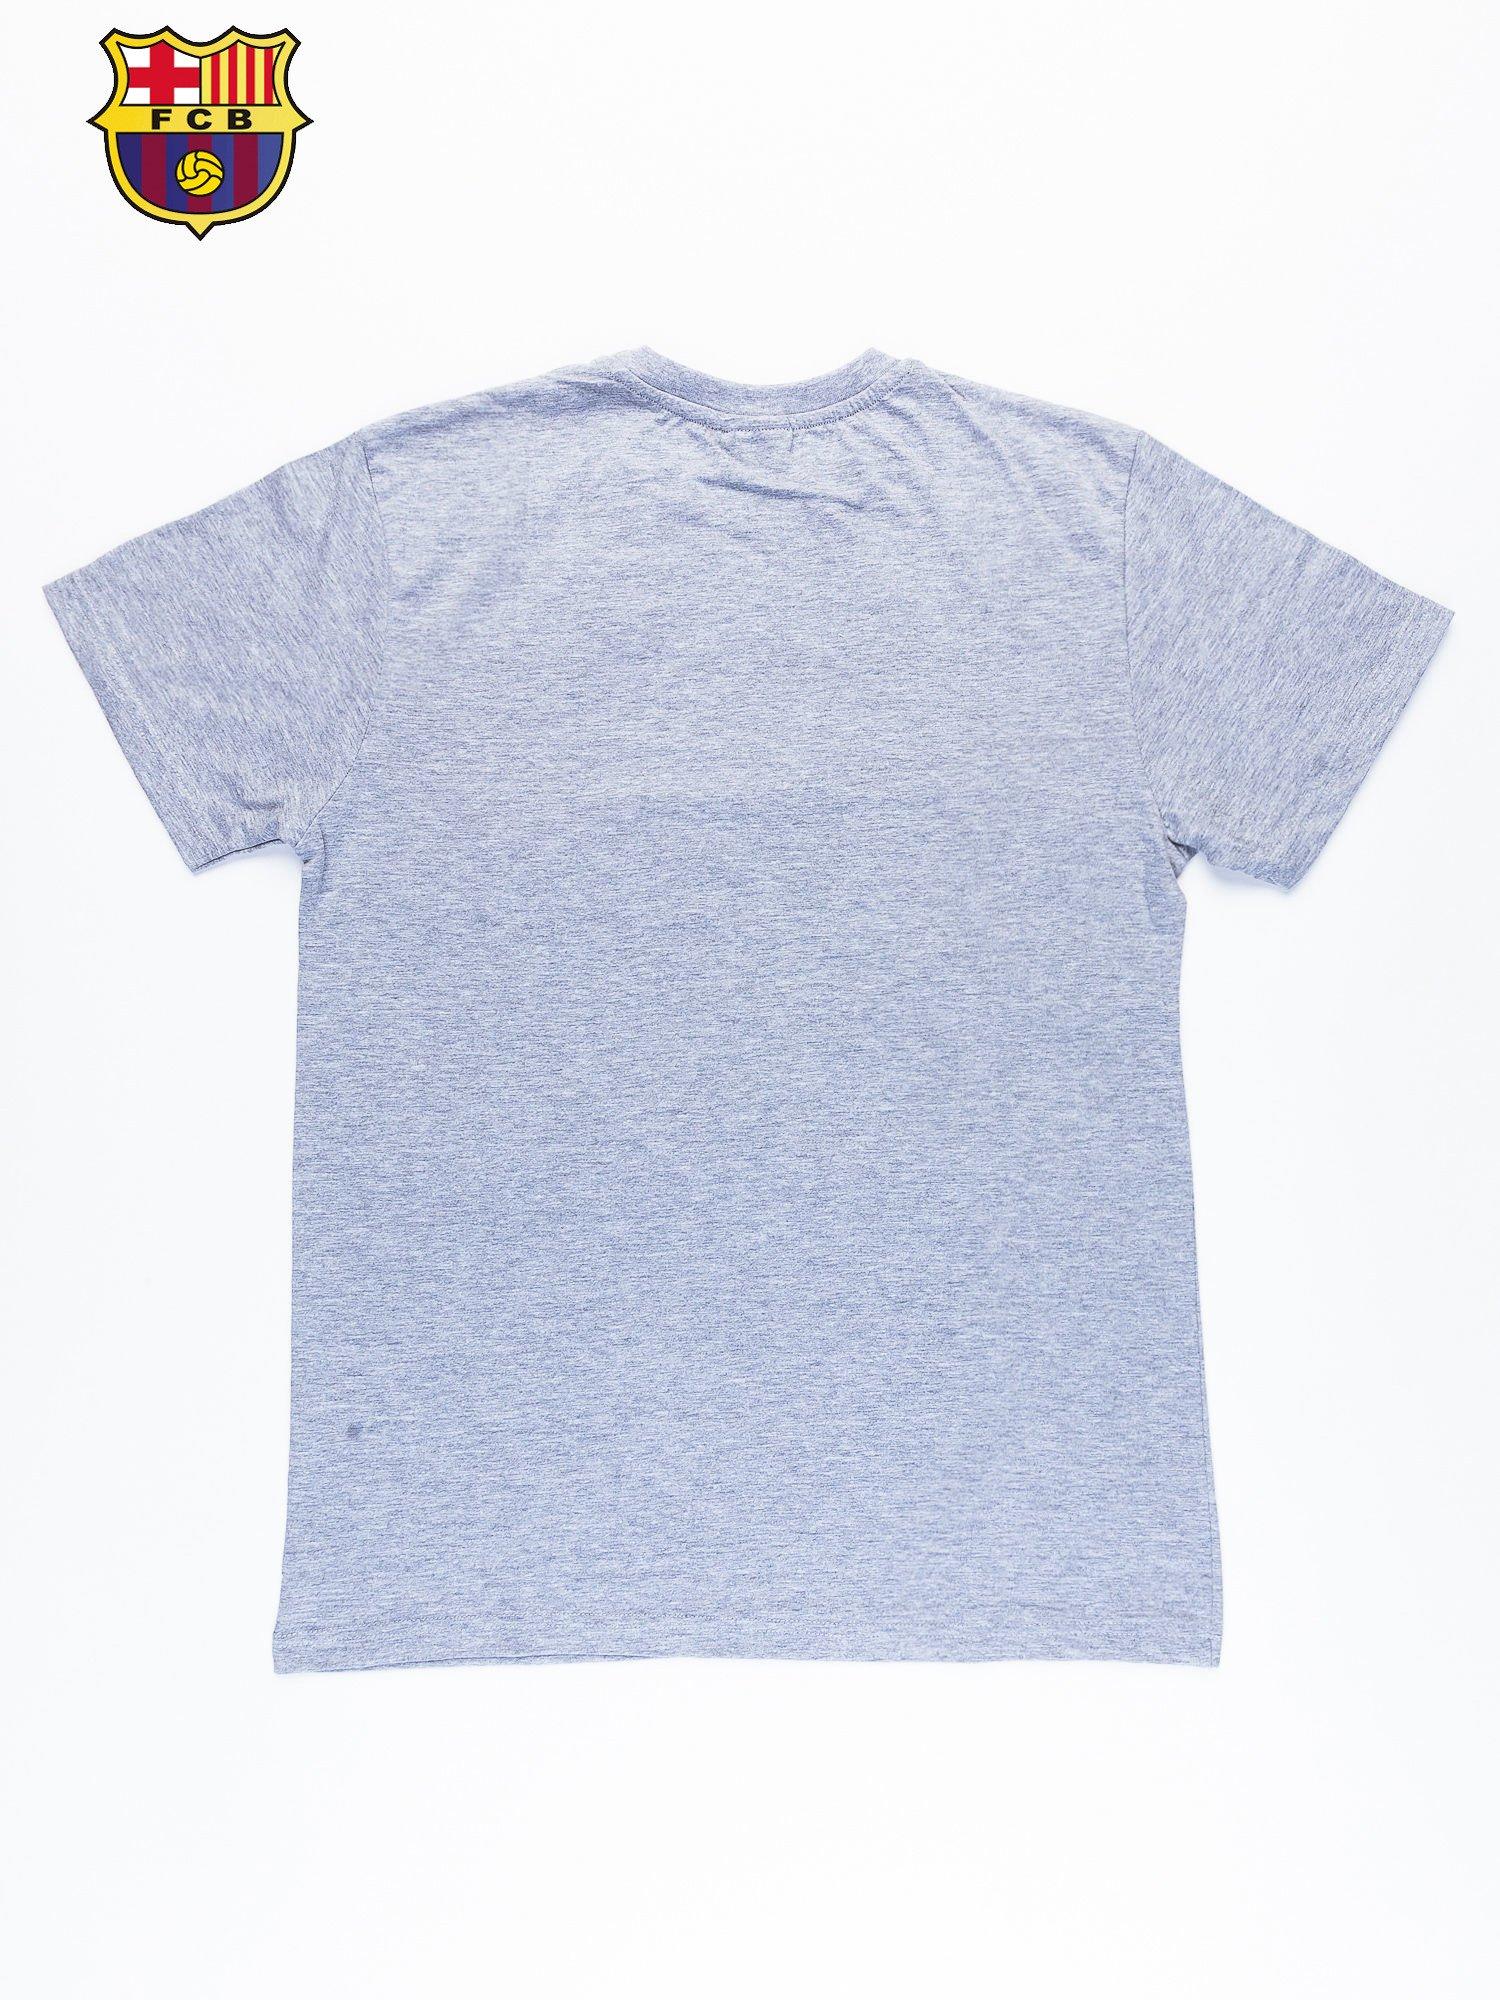 Szary t-shirt męski FC BARCELONA                                   zdj.                                  11